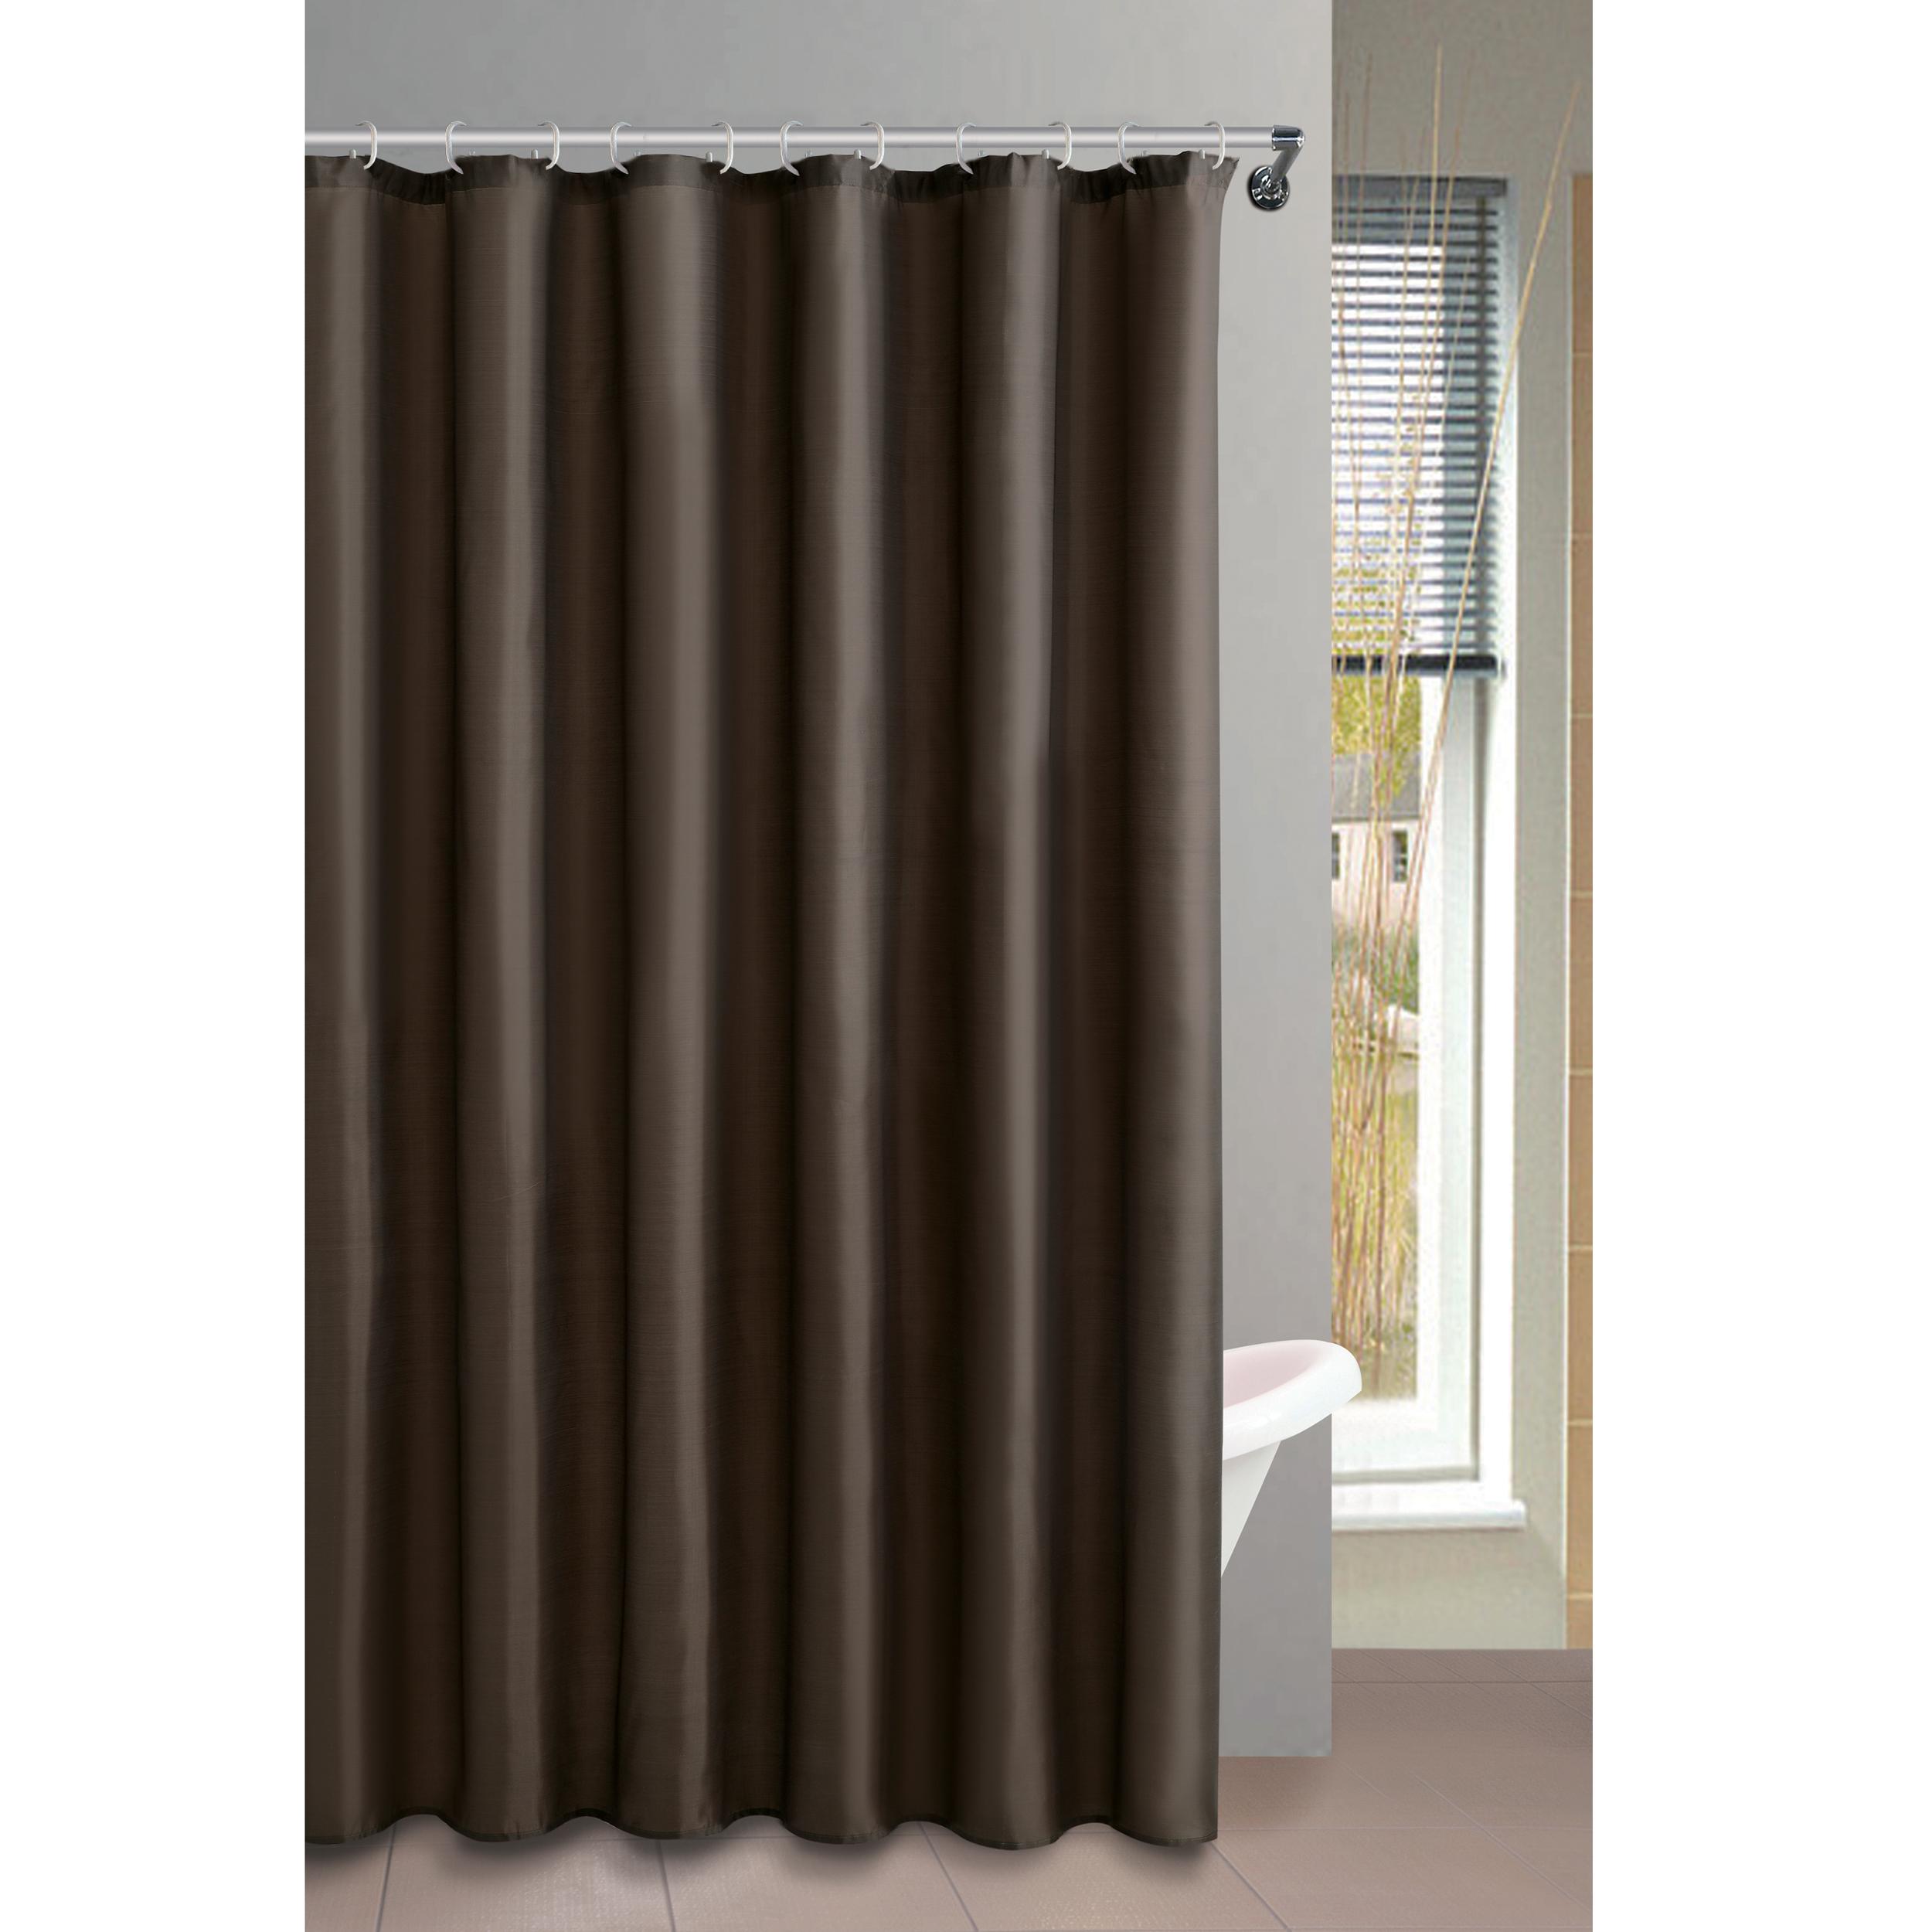 MSV Duschvorhang 180x200cm Anti Schimmel Textil Badewannenvorhang Wannenvorhang Braun